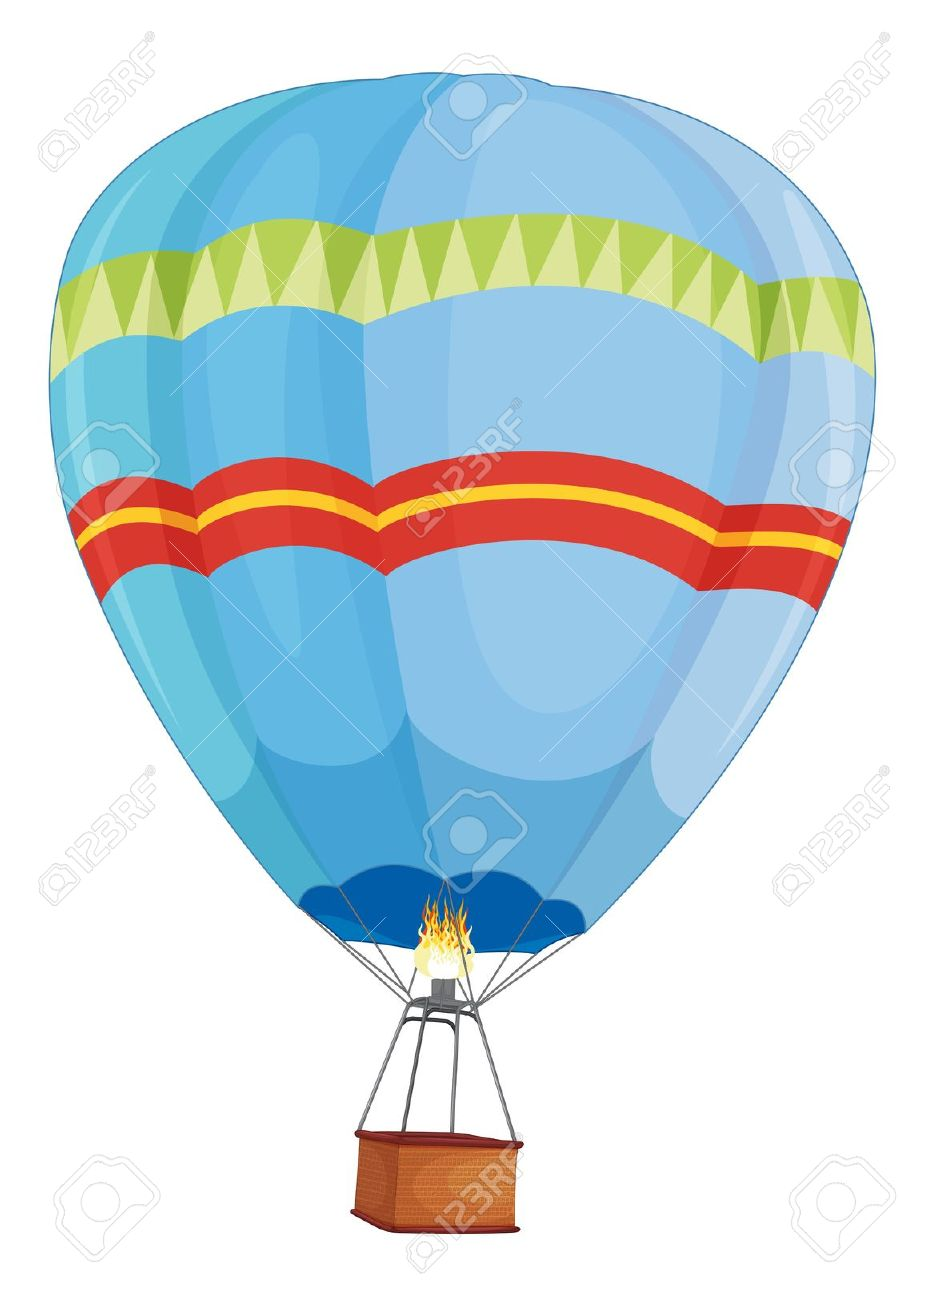 925x1300 Hot Air Balloon Clipart Light Blue